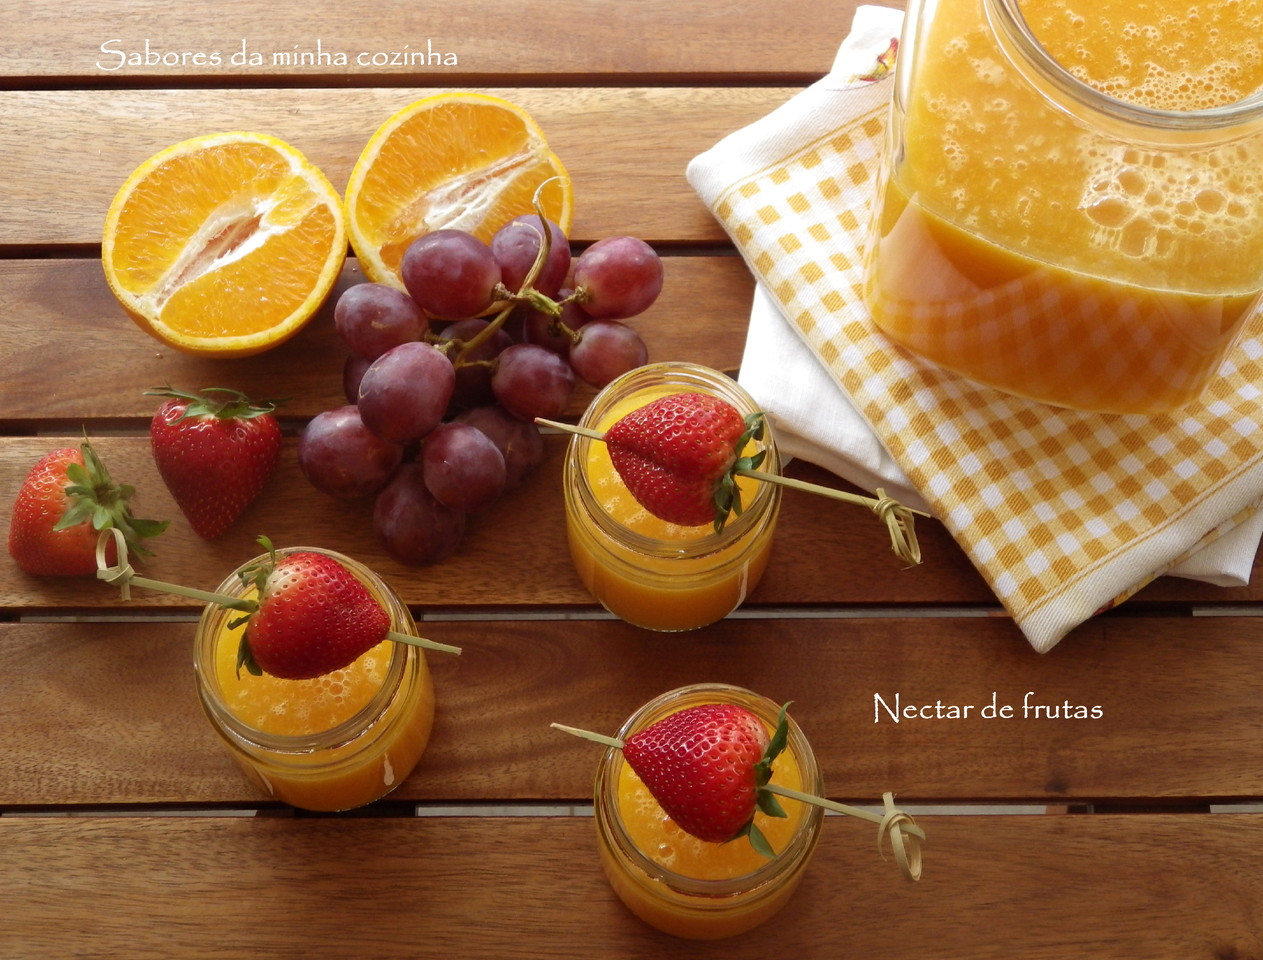 IMGP4769-Nectar de frutas-Blog.JPG